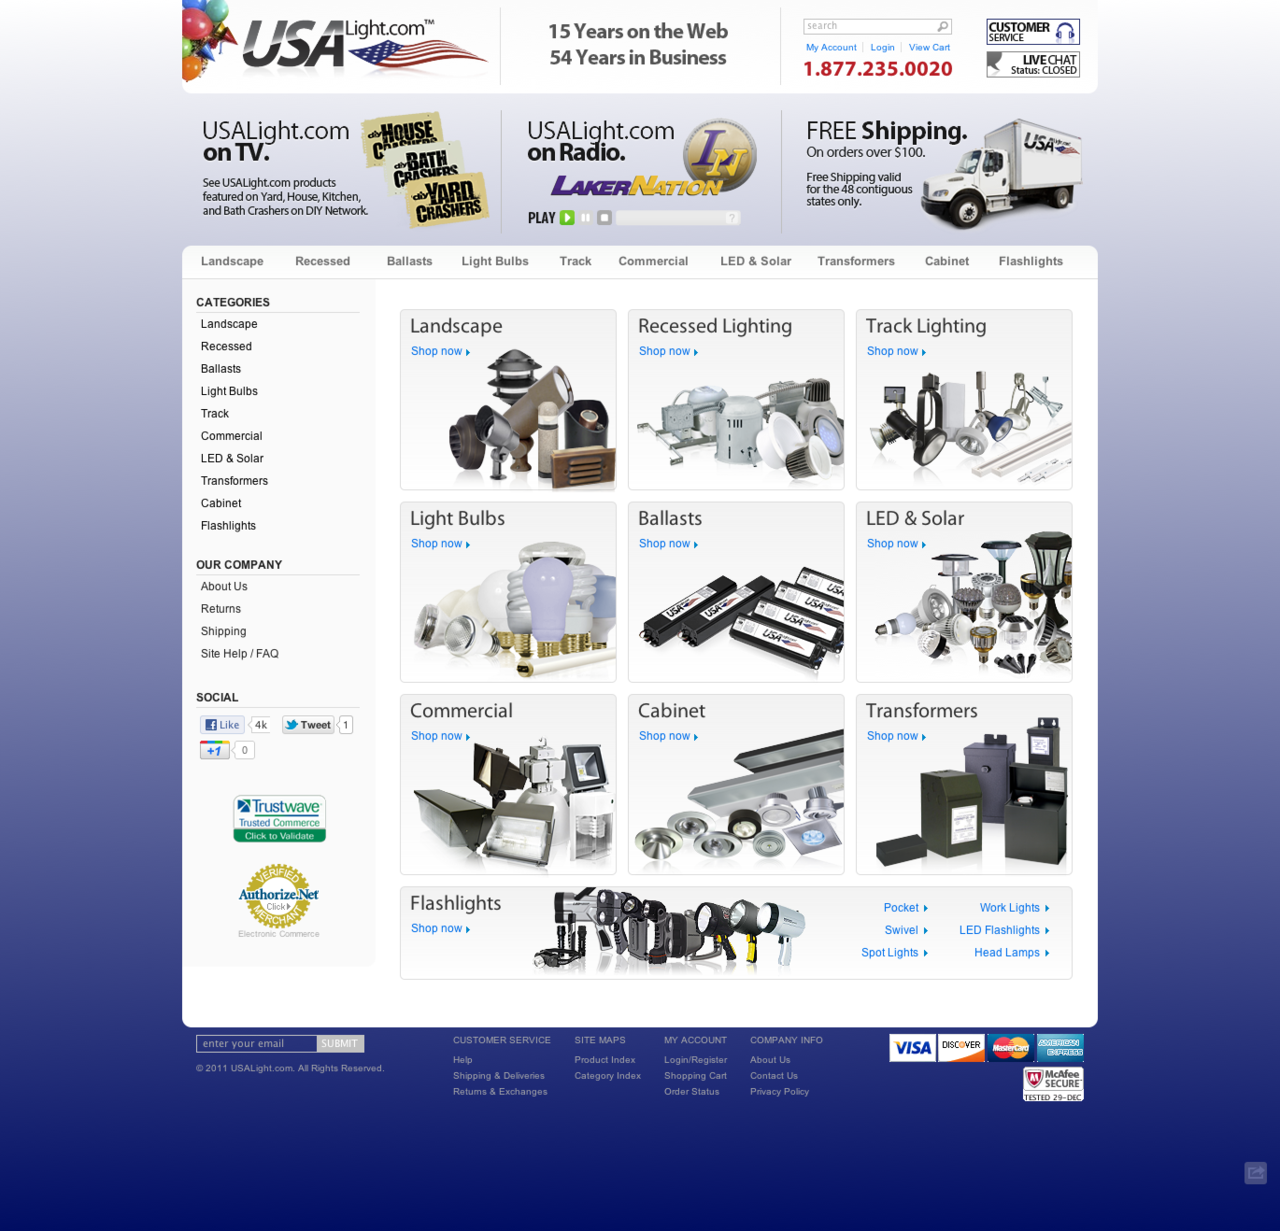 www.usalight.com